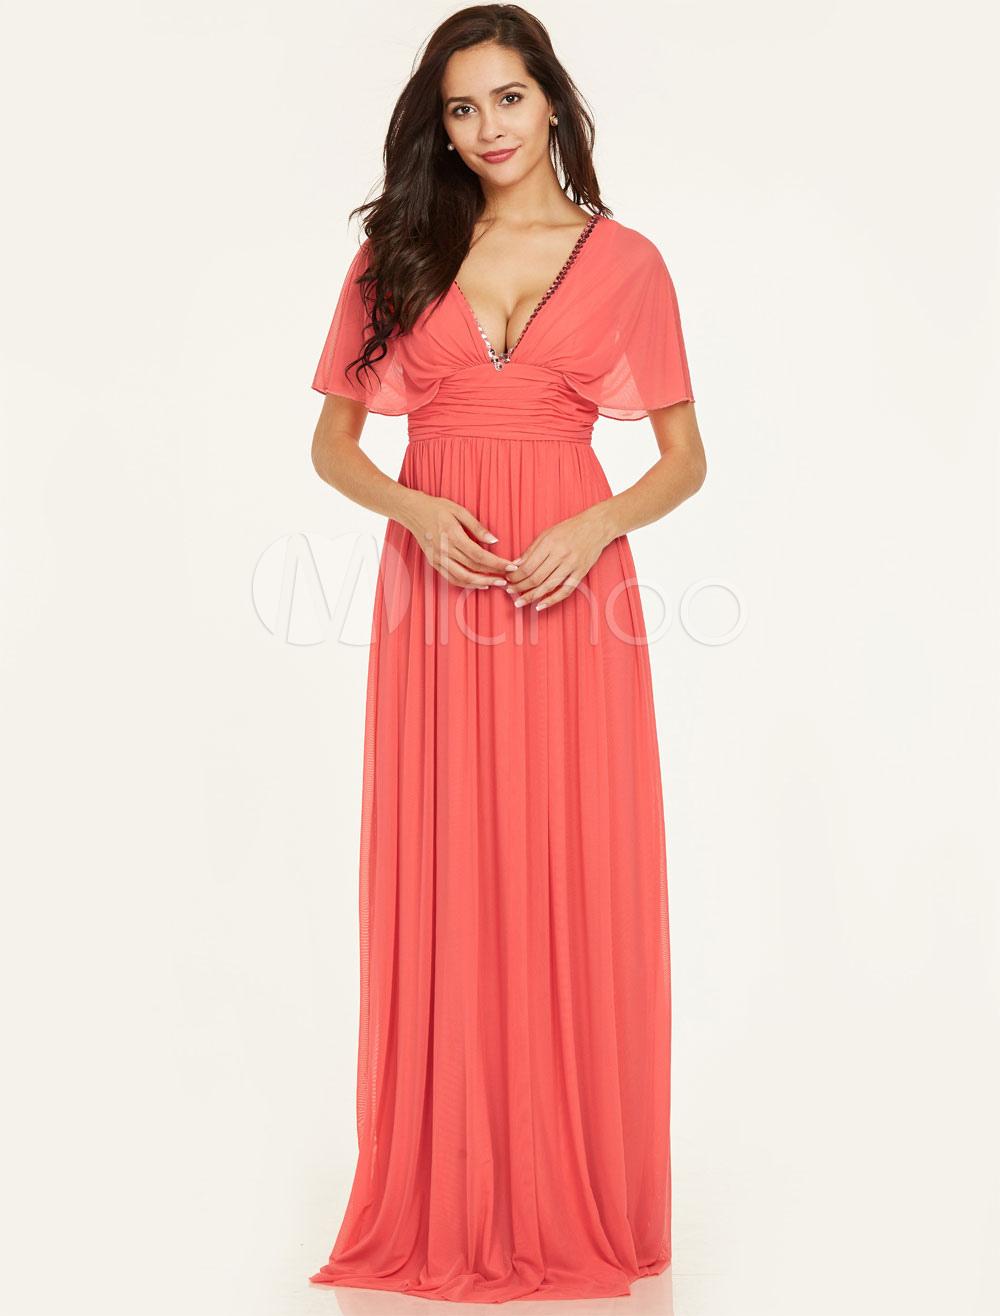 Buy Prom Dresses Long Chiffon V Neck Short Sleeve Beaded Floor Length Formal Party Dresses for $74.79 in Milanoo store